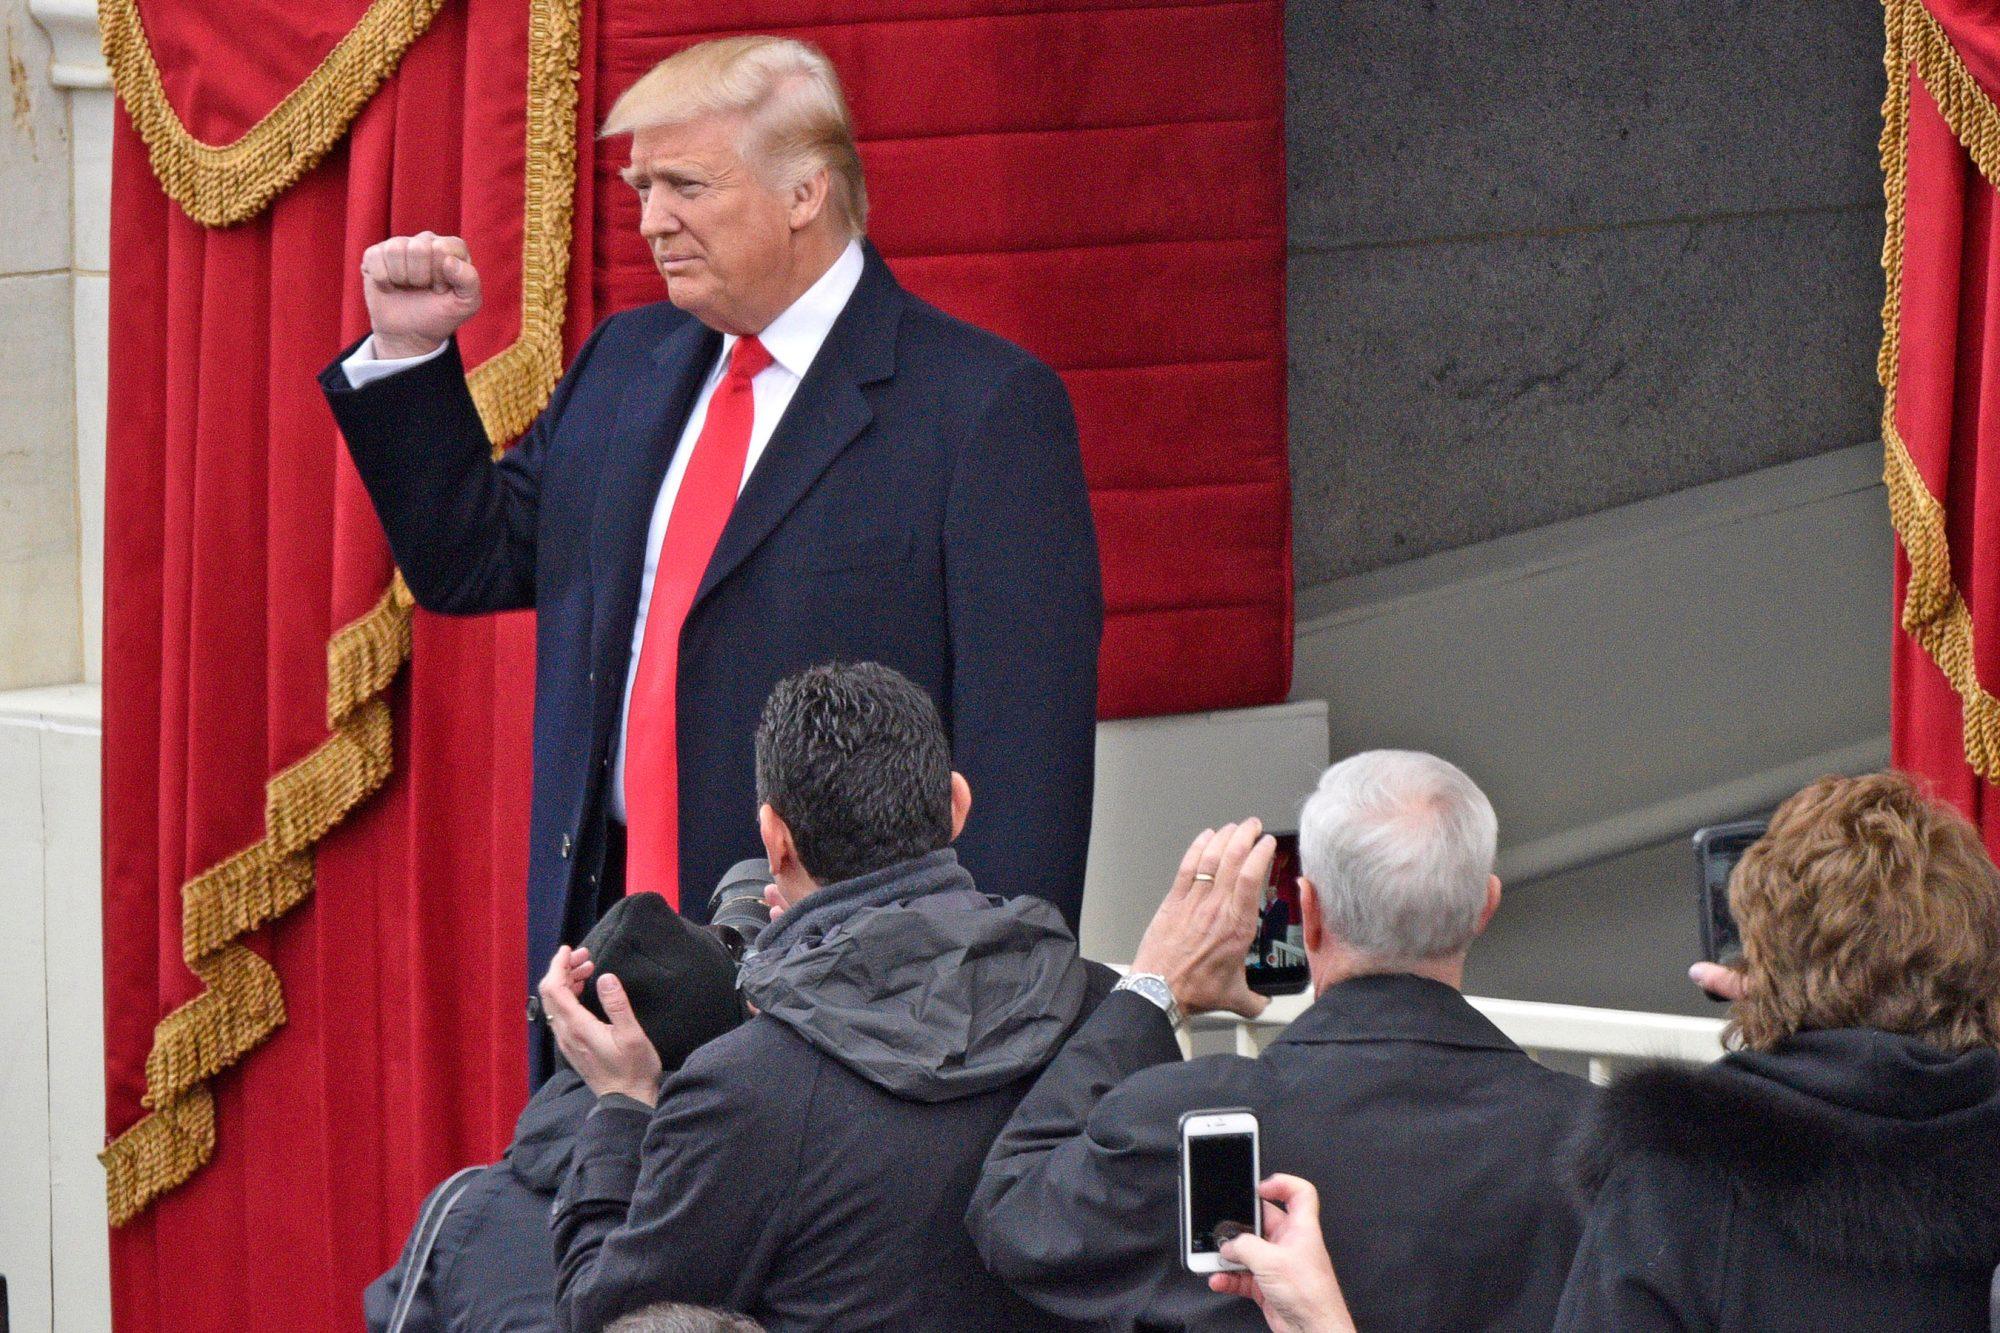 ABC News: The Inauguration of Donald J. Trump